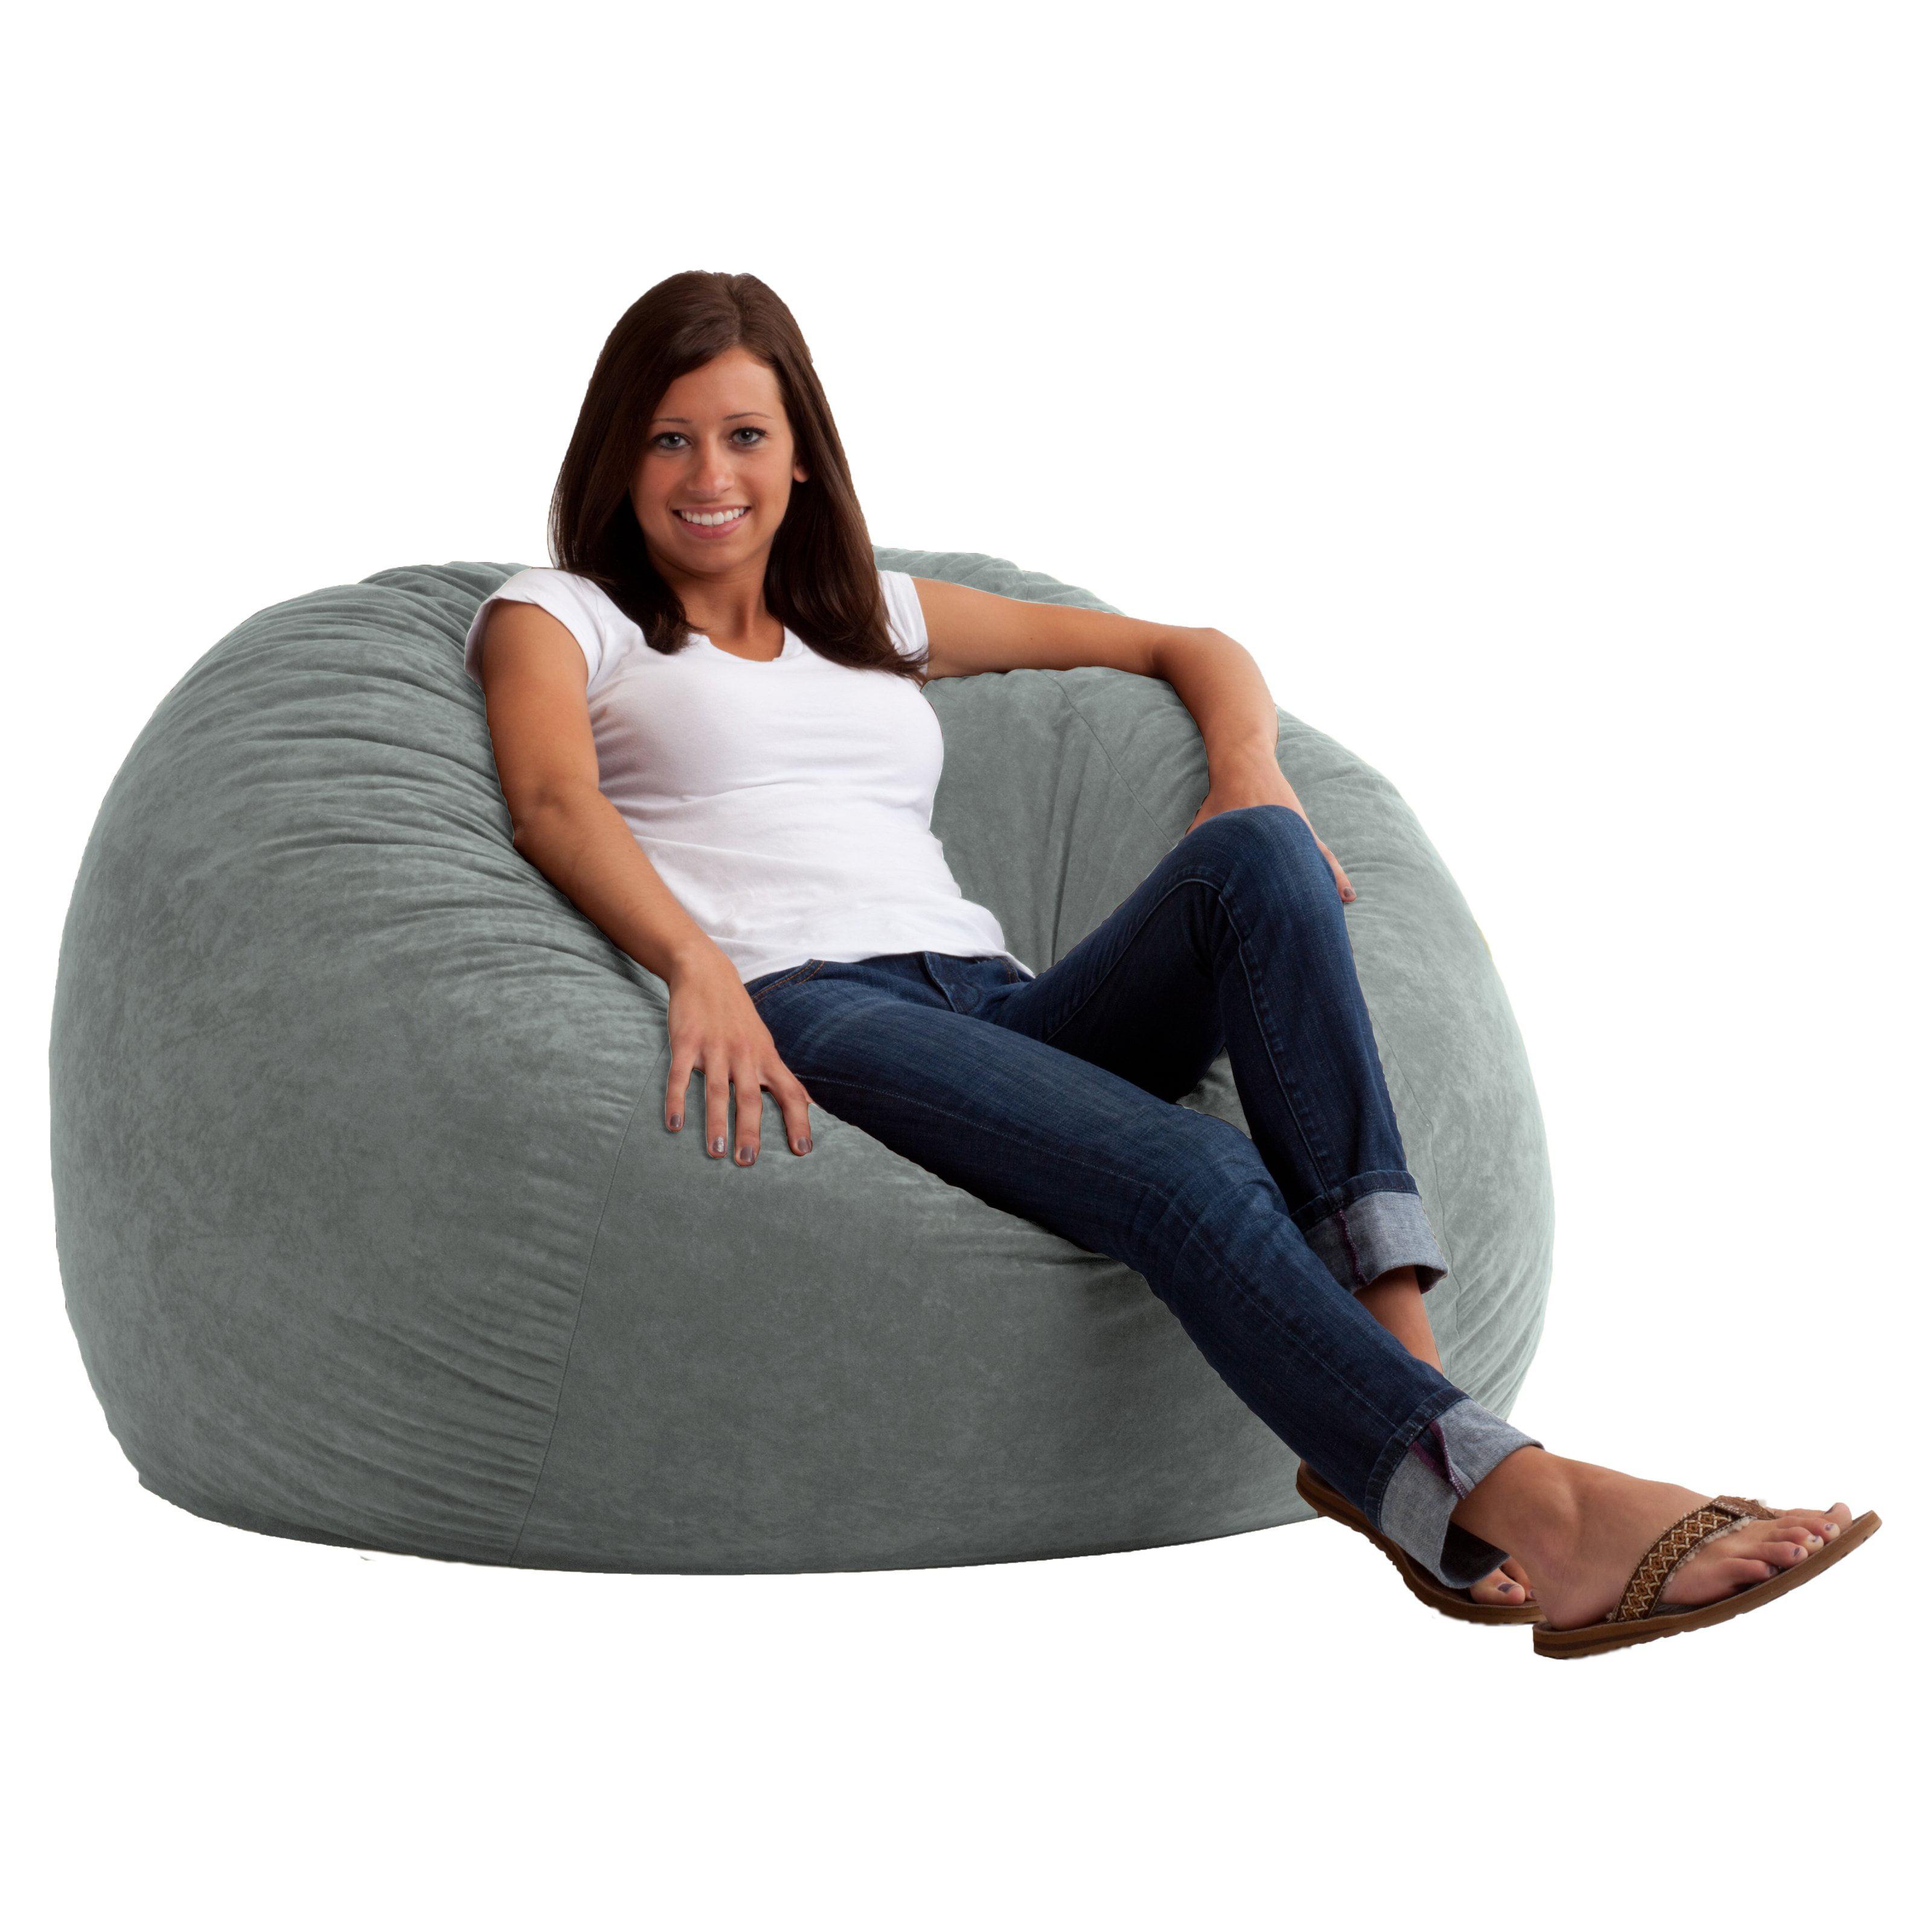 Big joe bean bag chair - Big Joe Bean Bag Chair 56